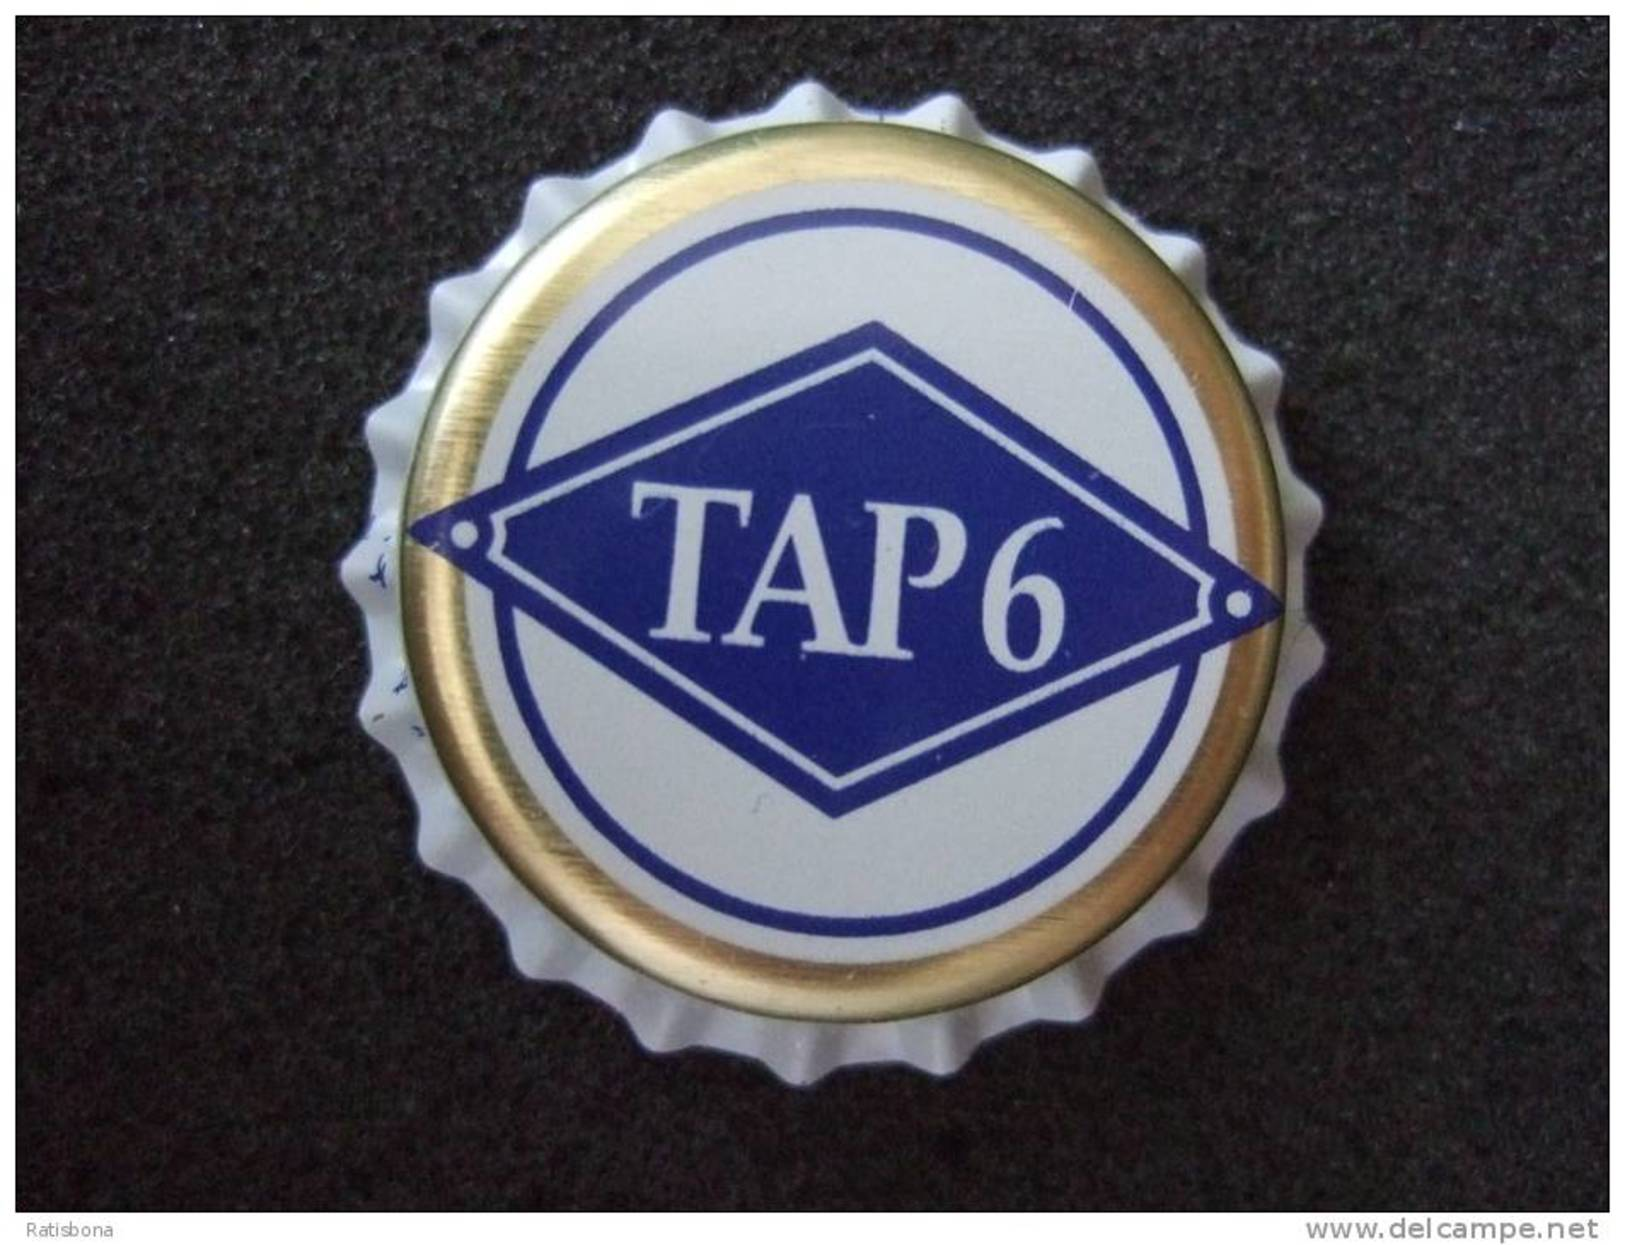 Übergangs-KK, Br. G.Schneider, TAP 6 - 1 Kronkorken, Capsule Neuve, Crowncaps New - Bier